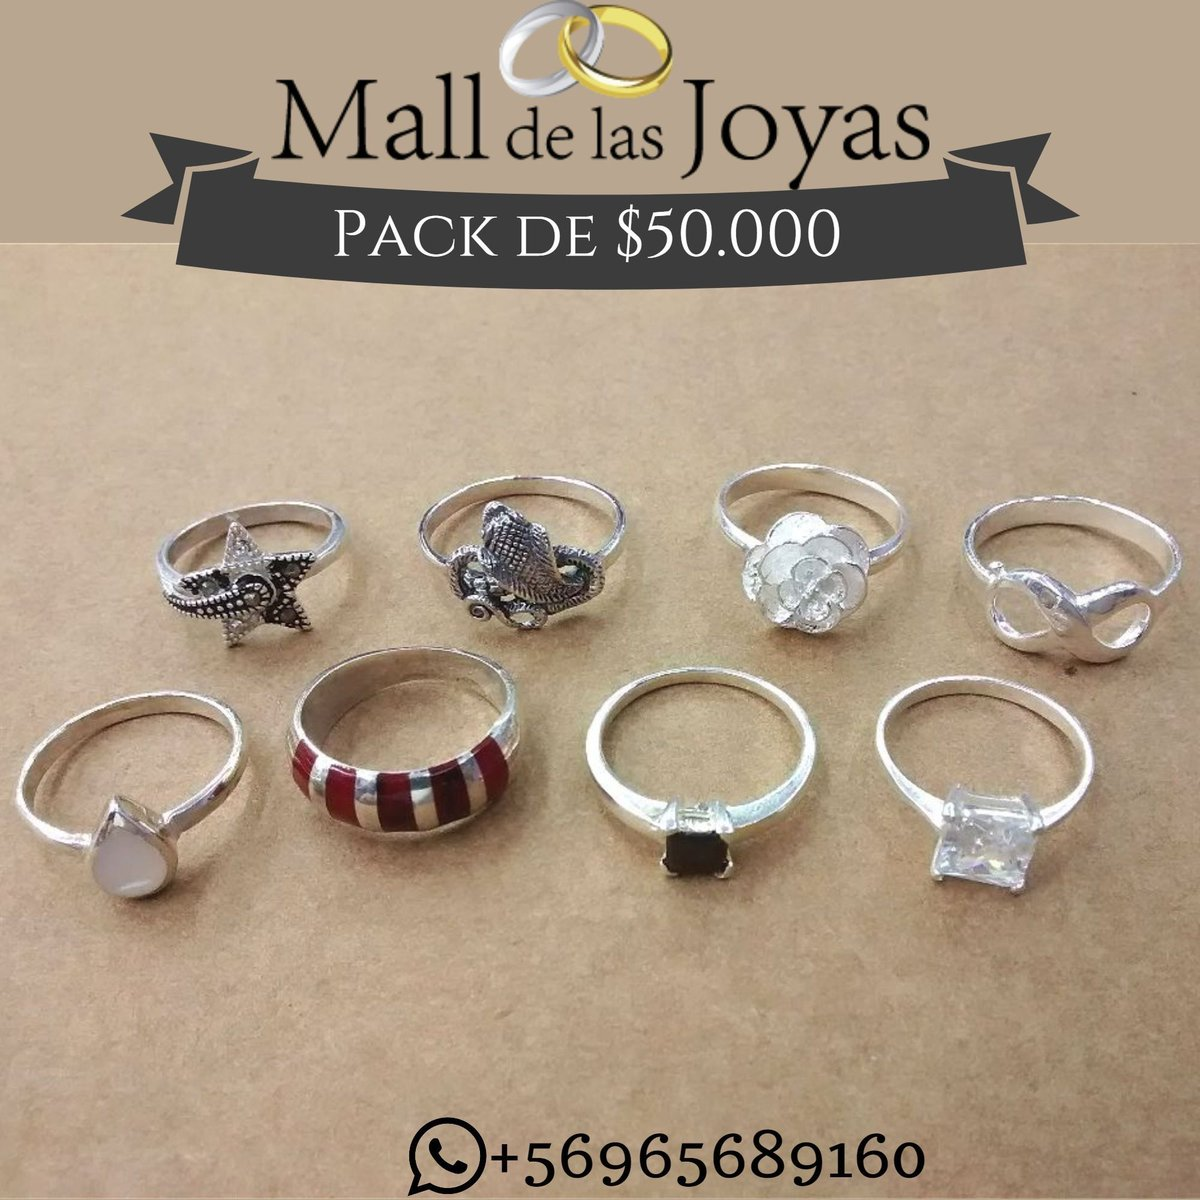 75ae22e2f90f Mall de las Joyas on Twitter